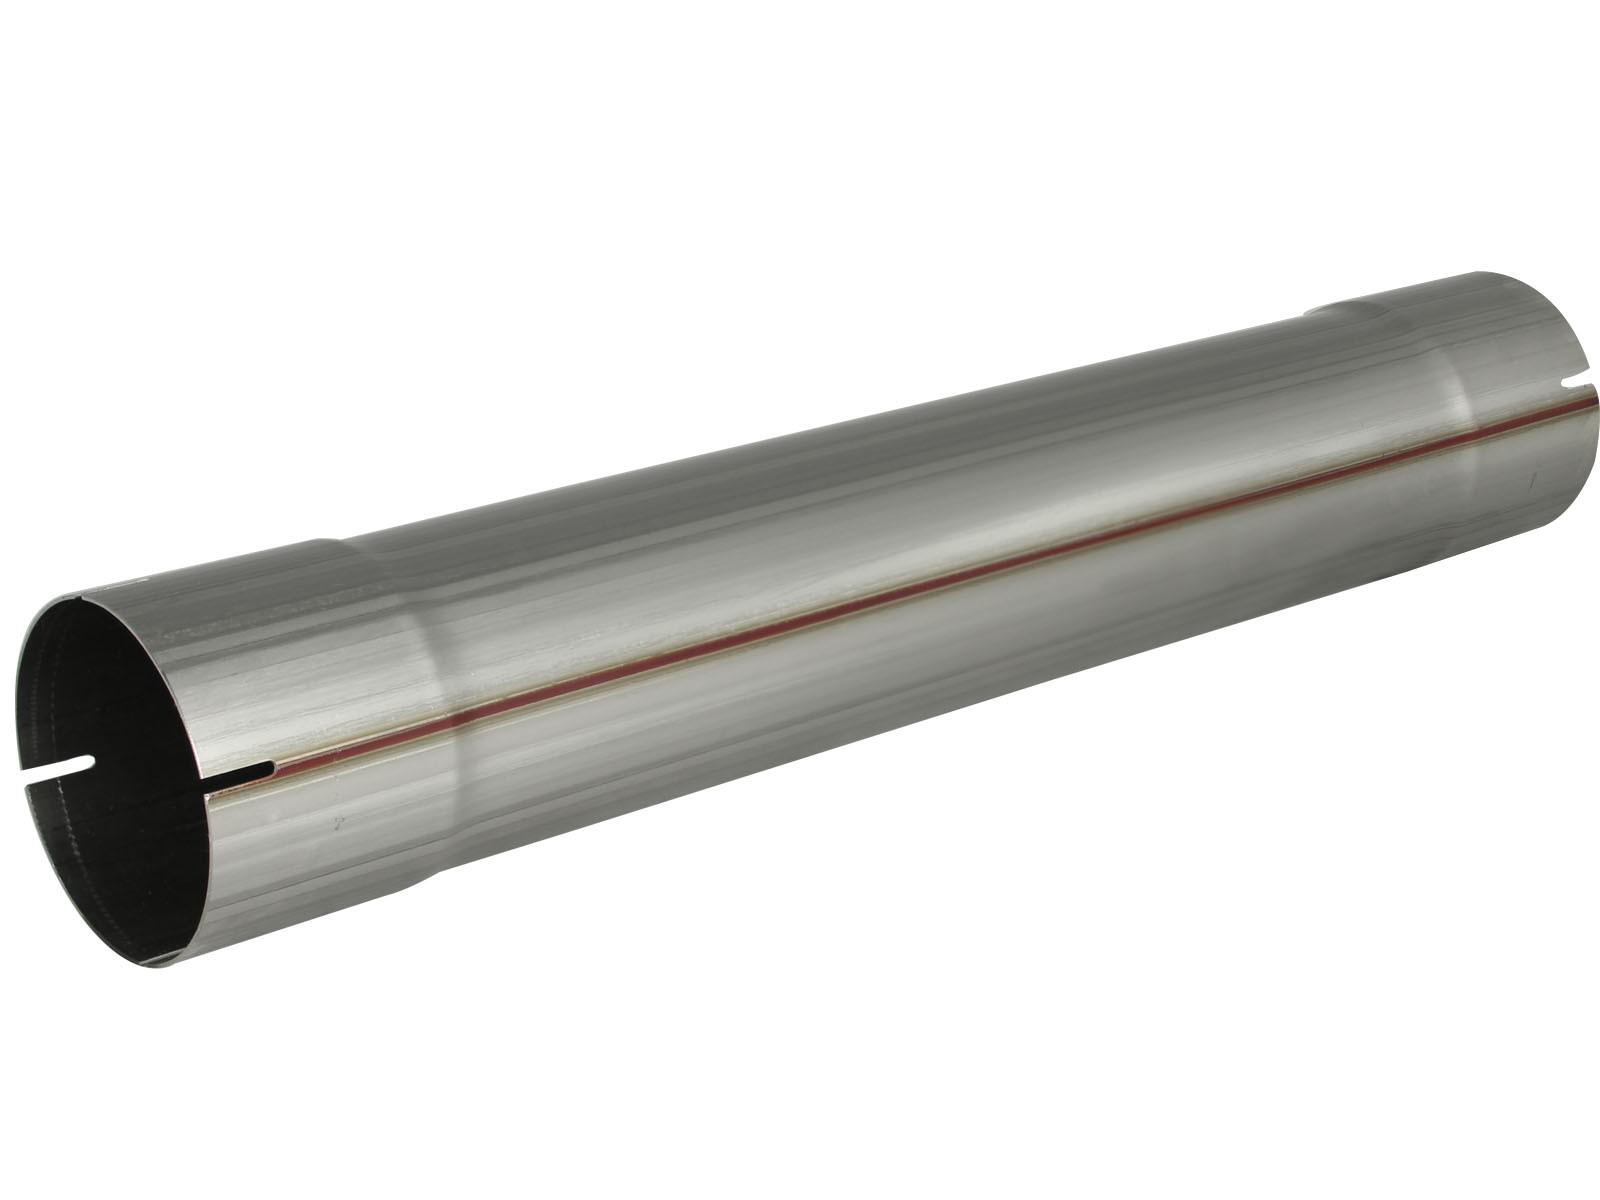 "aFe POWER 49-91041 MACH Force-Xp 5"" 409 Stainless Steel Muffler"